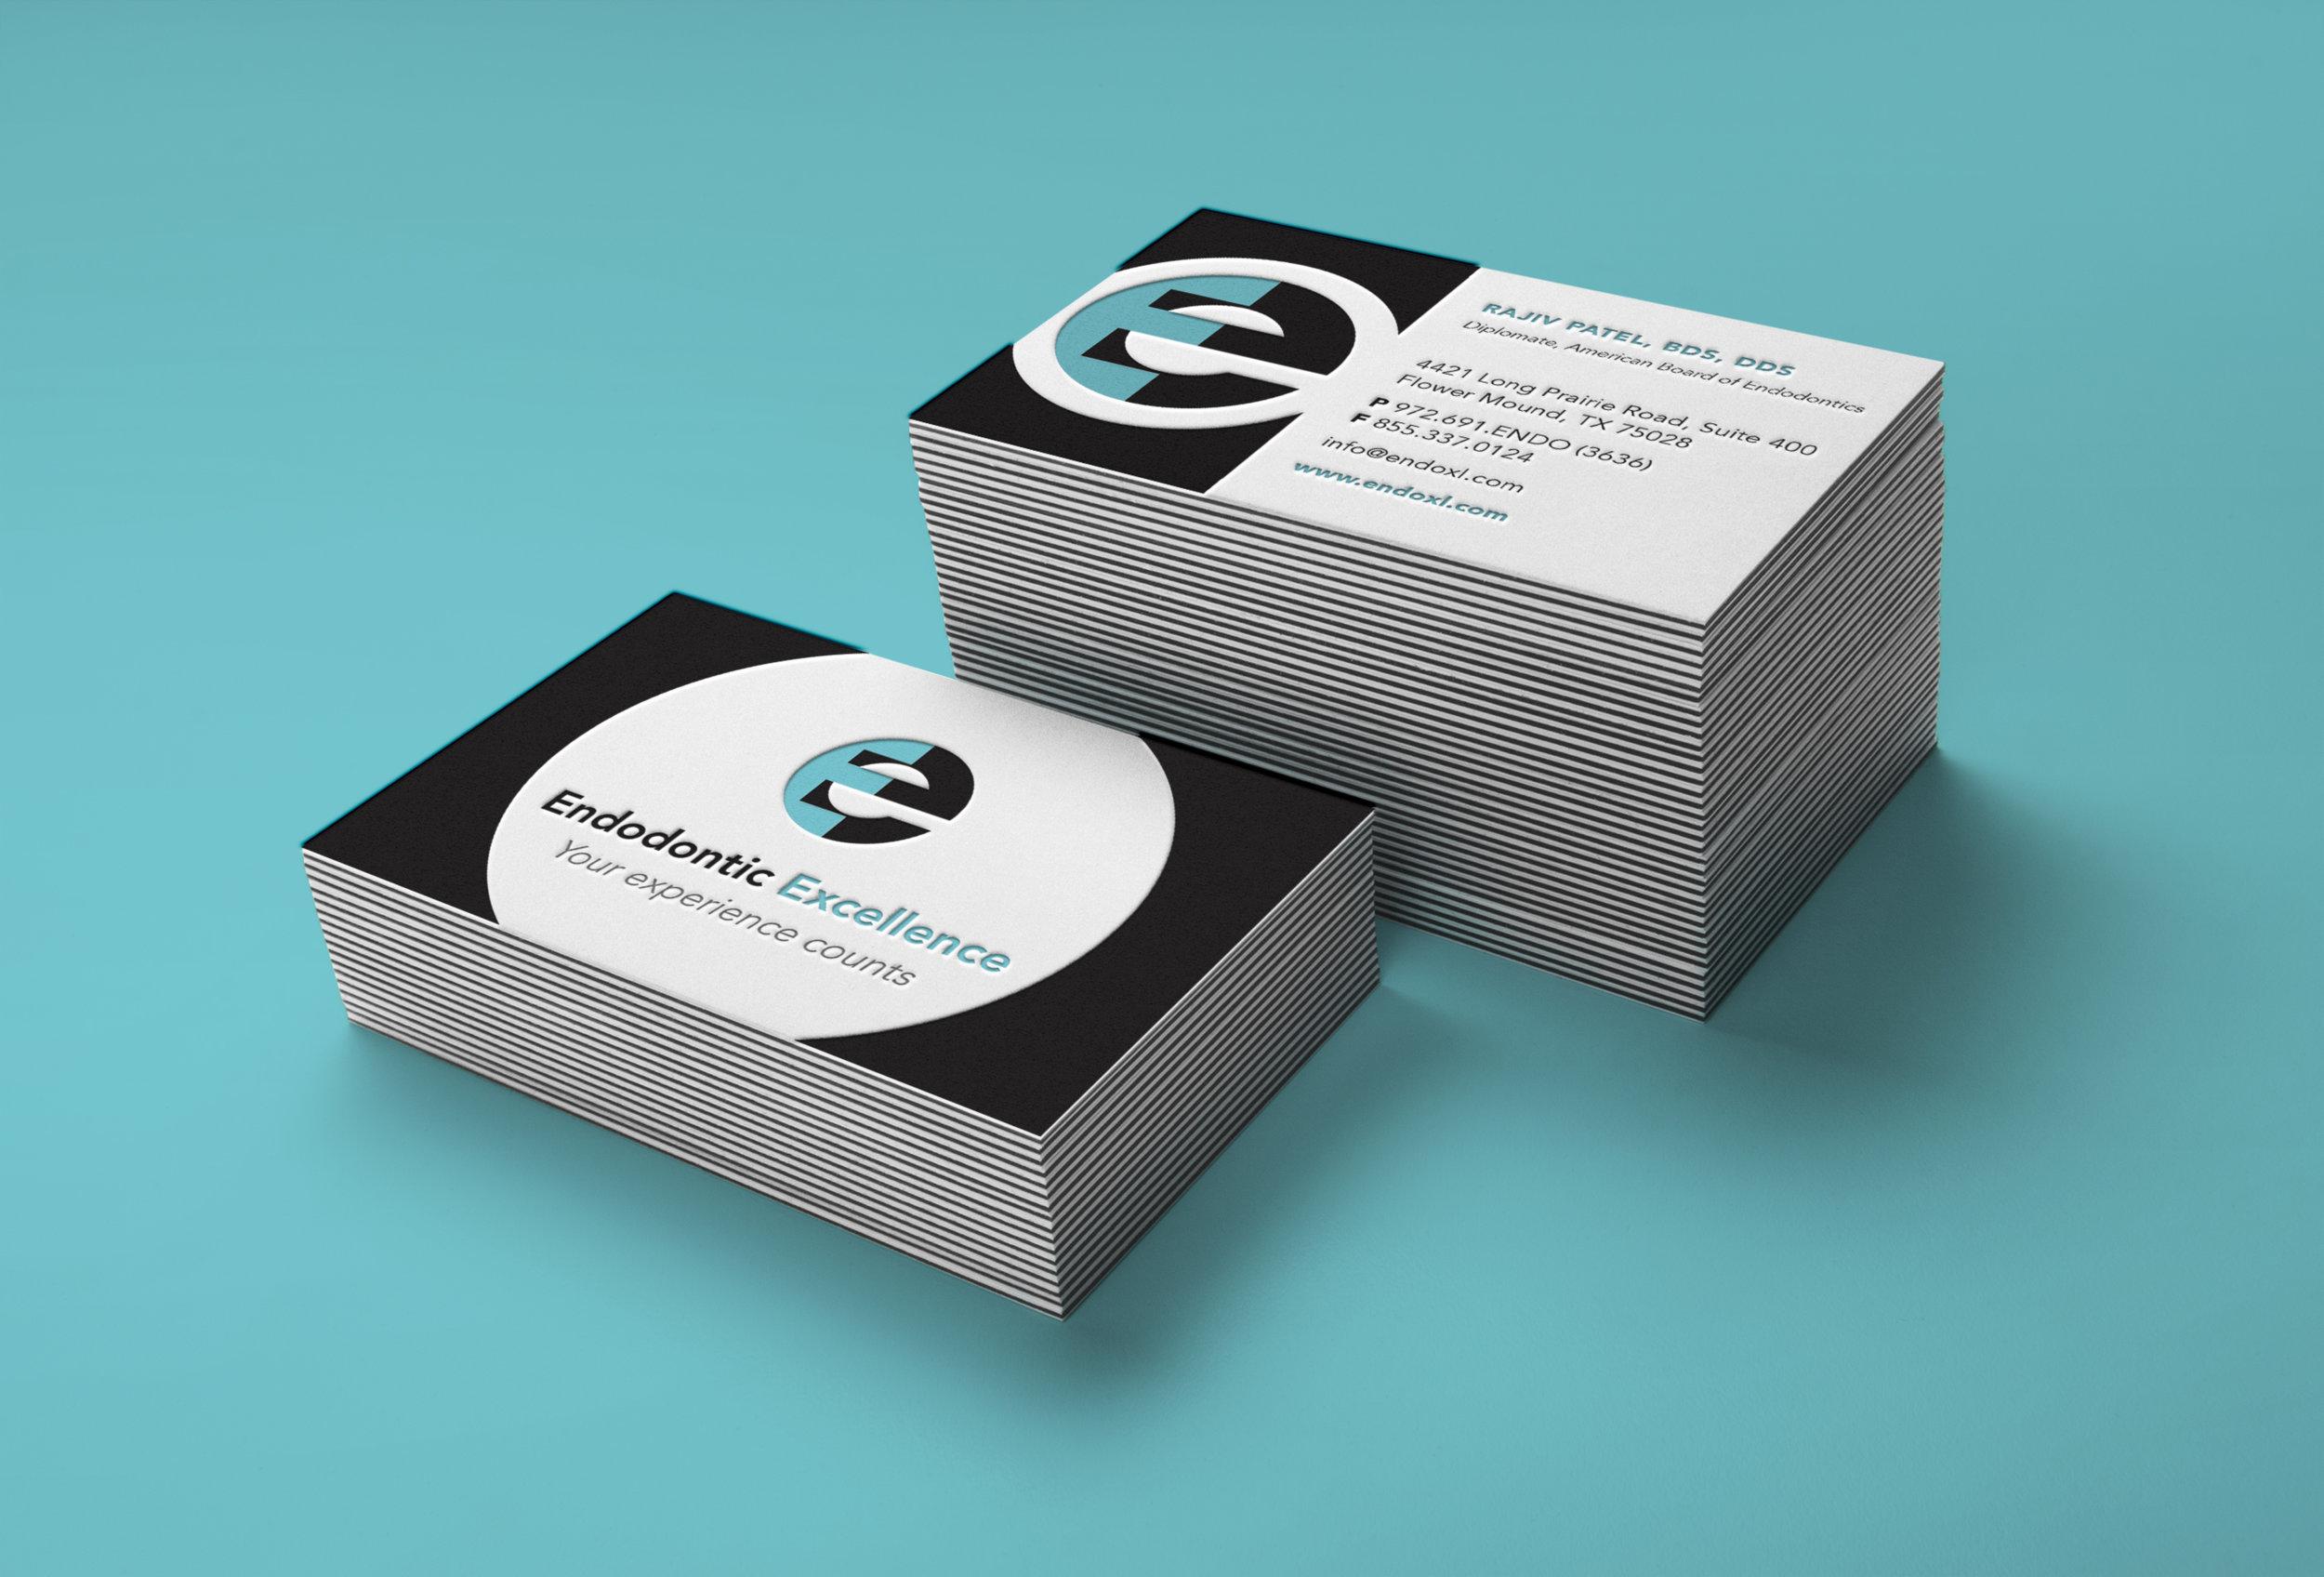 endo-ex-biz cards.jpg